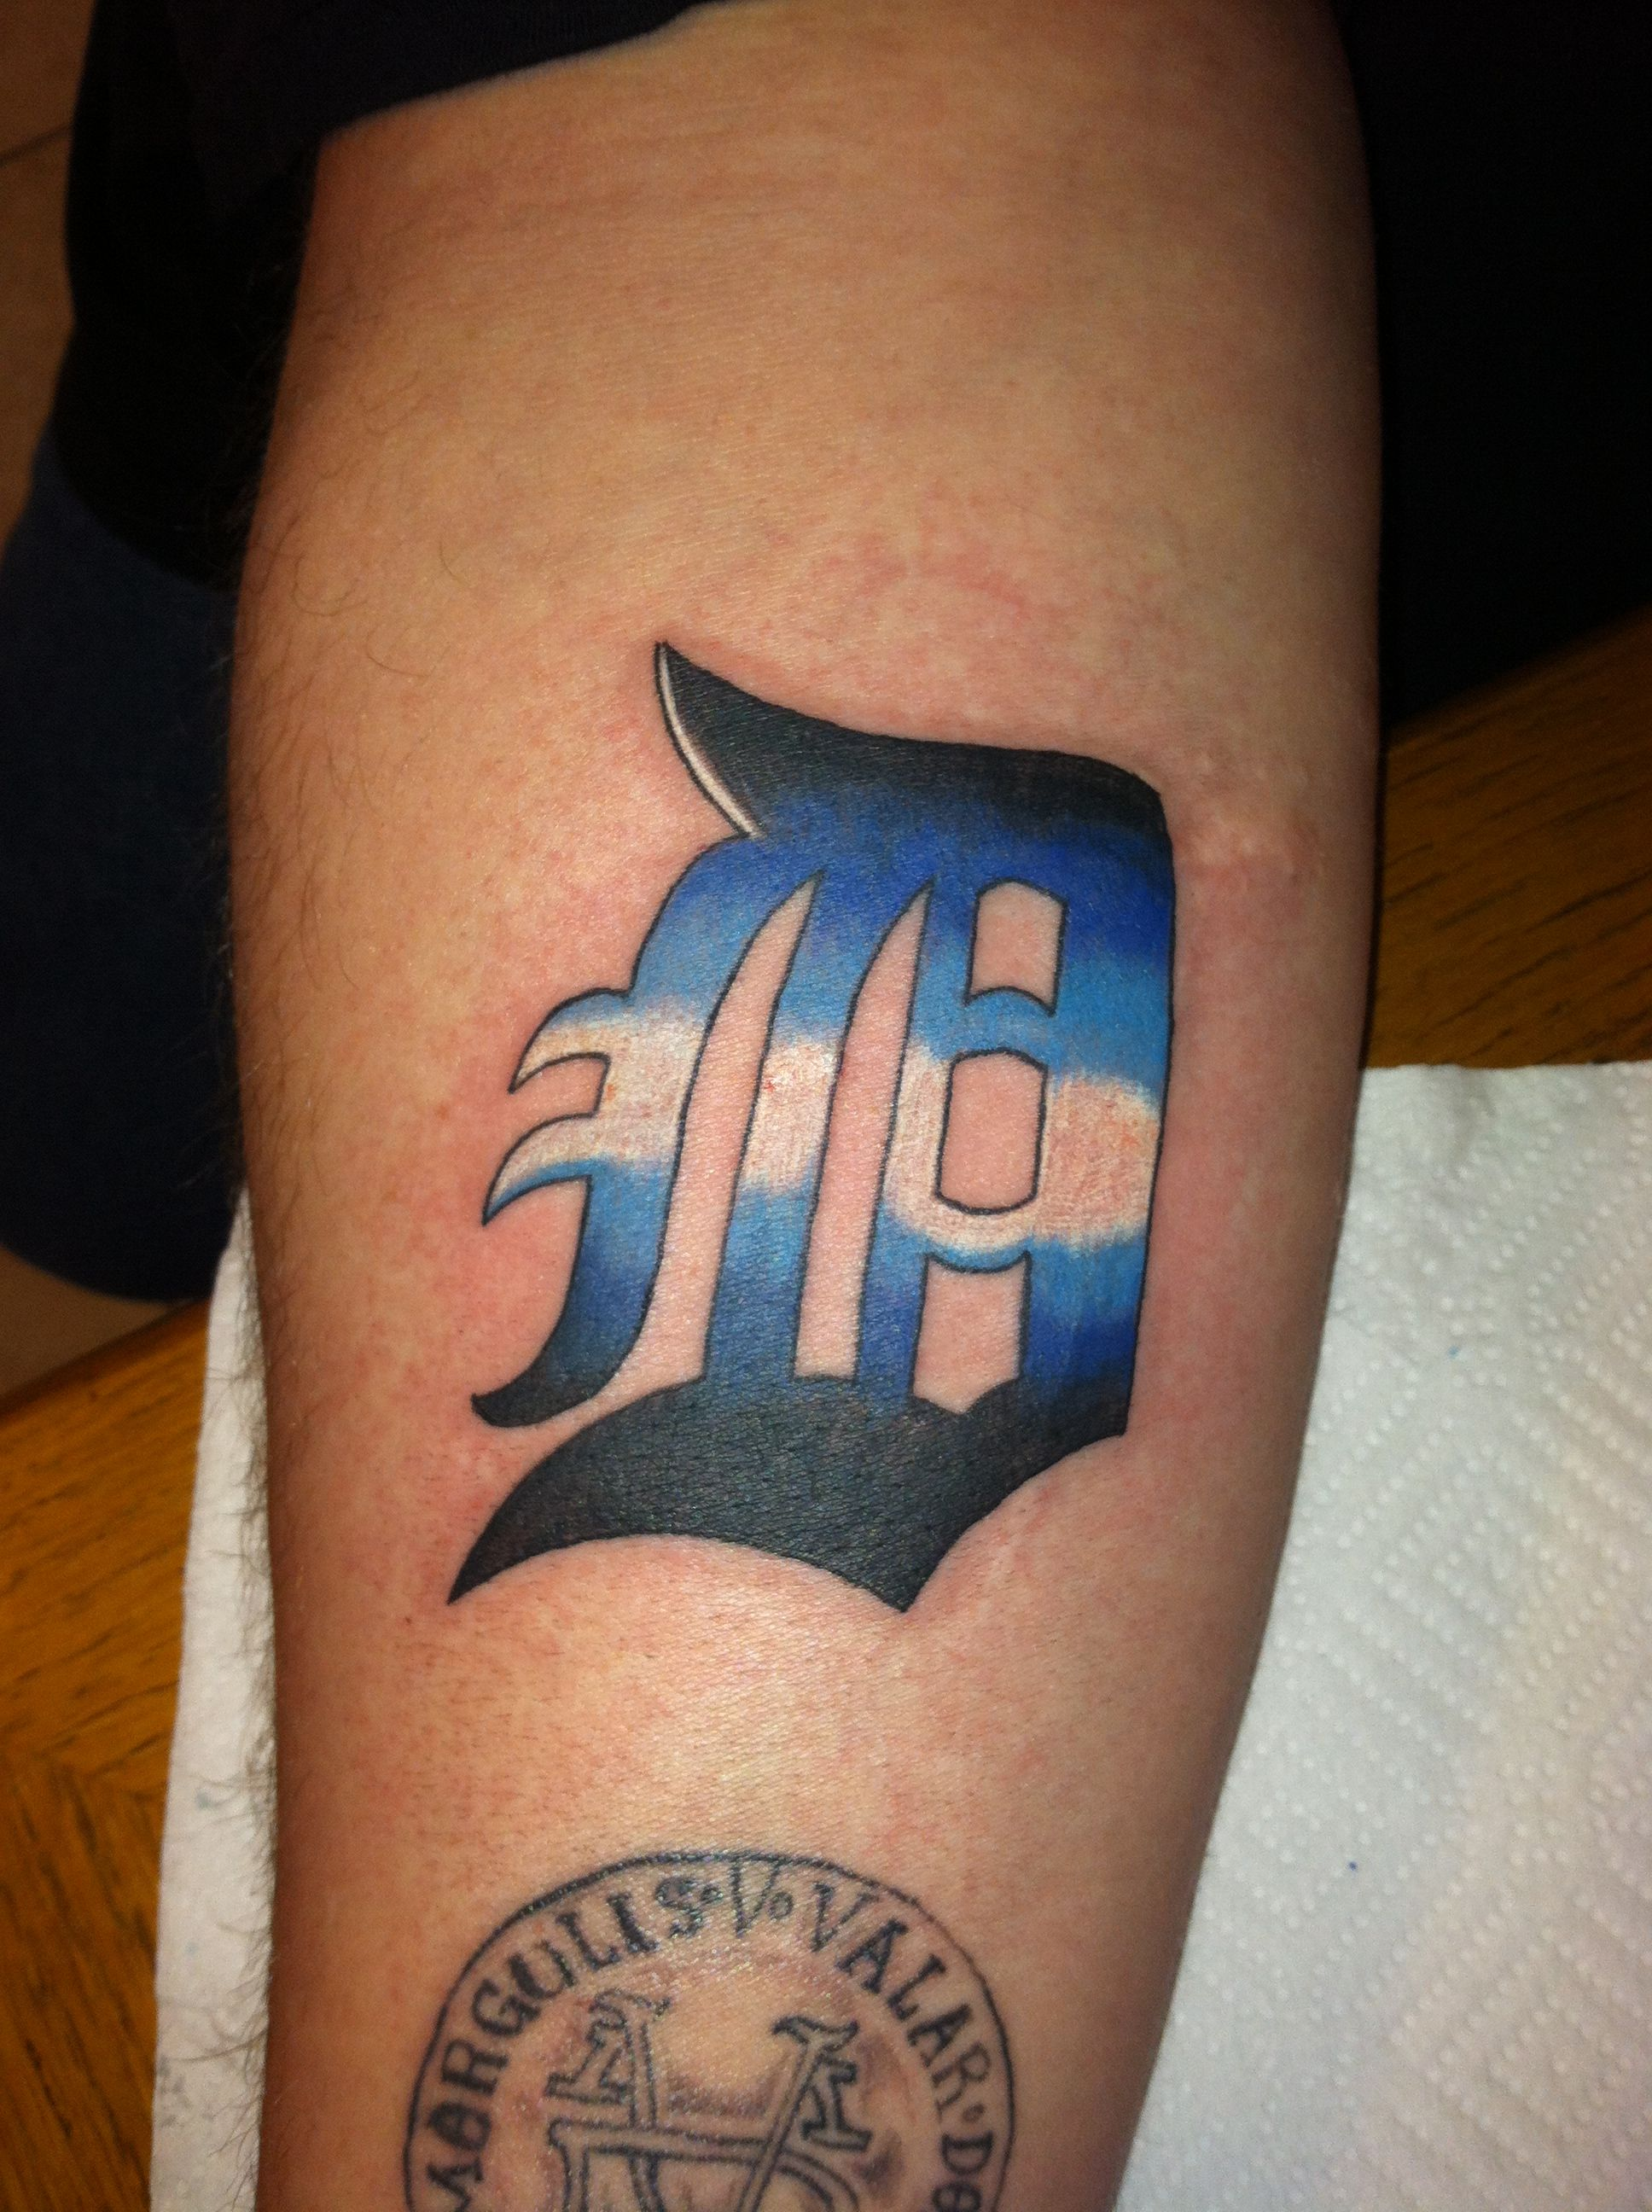 Love detroit detroit tigers tattoos pinterest girls hannah